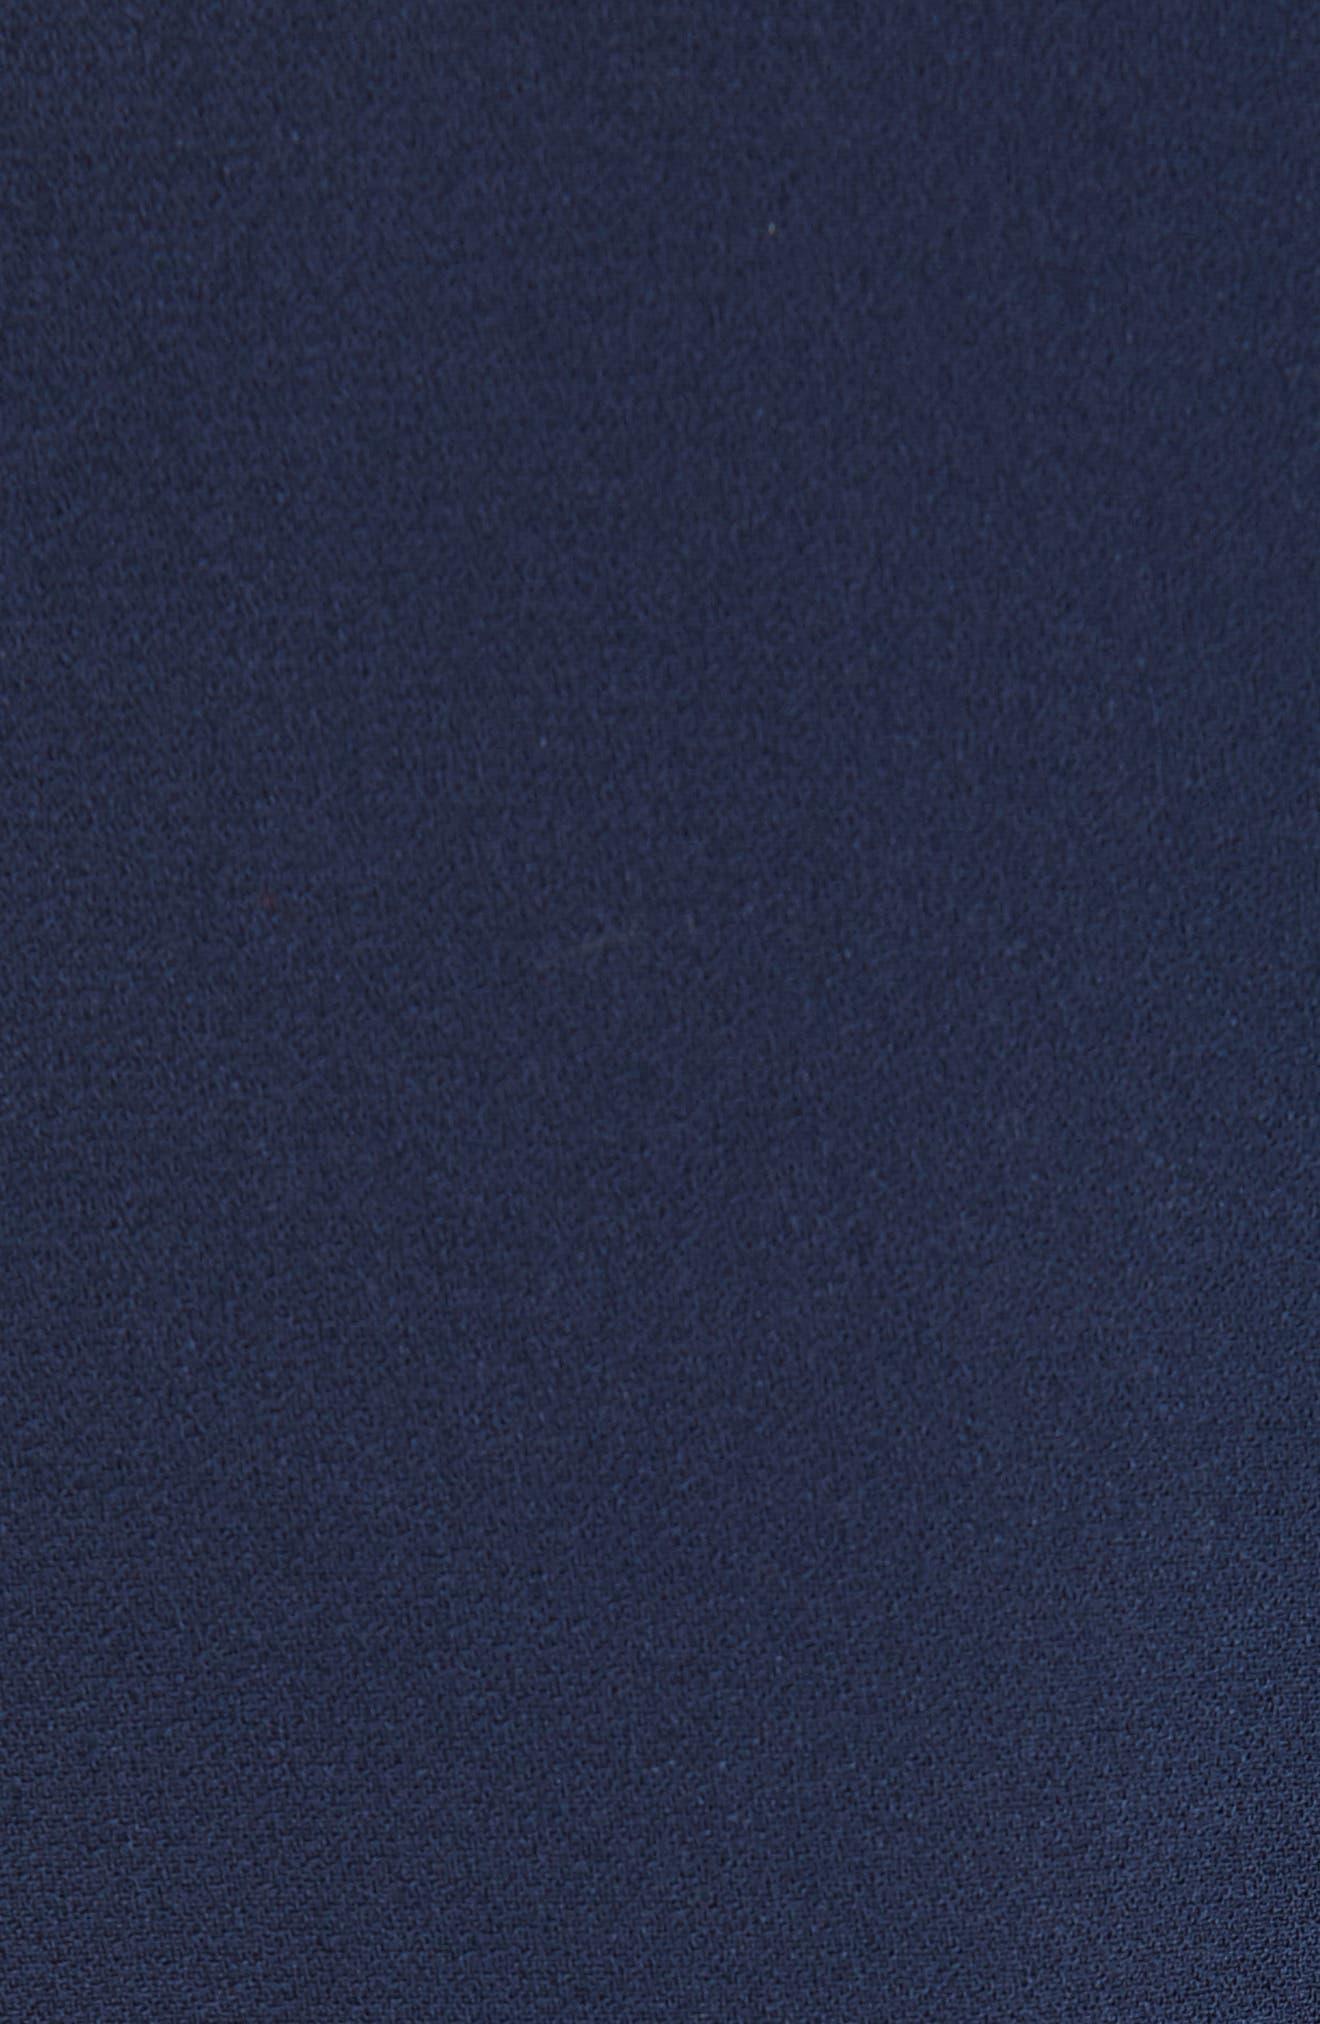 Delakety Asymmetrical A-Line Dress,                             Alternate thumbnail 6, color,                             DEEP BLUE FANTASY